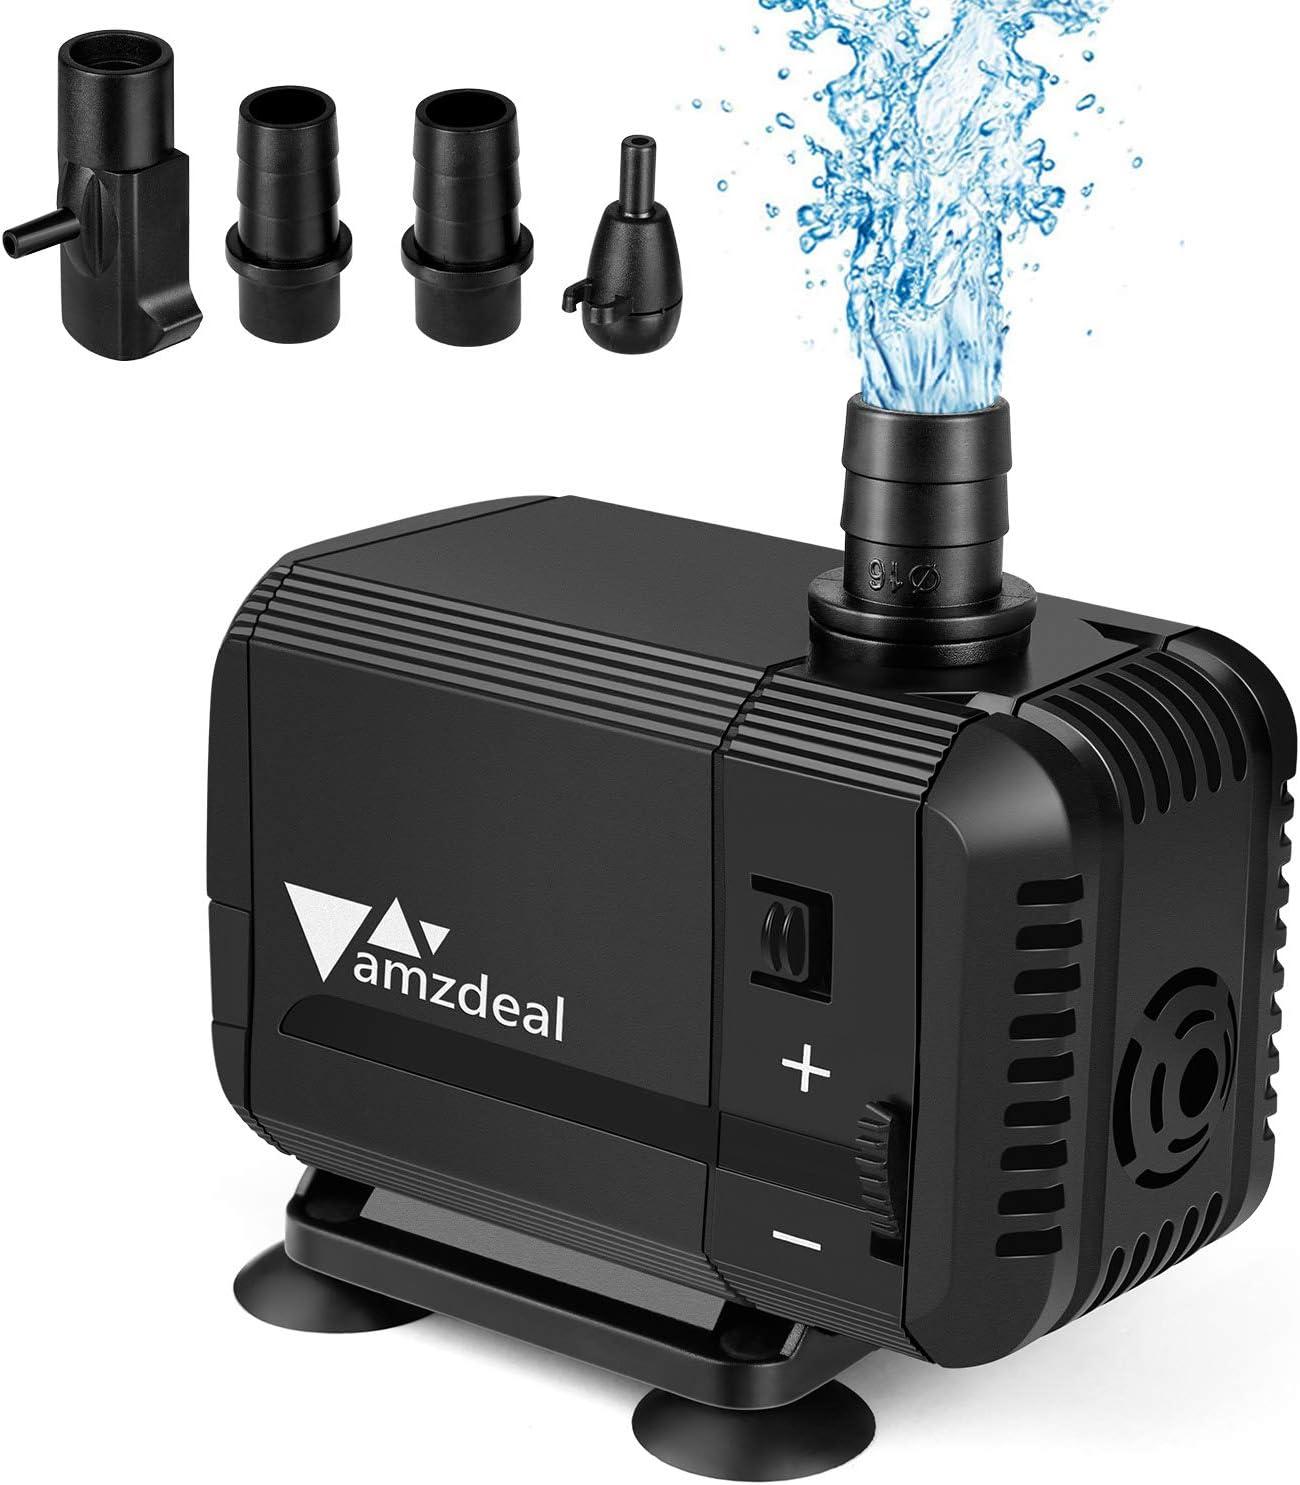 amzdeal Bomba Sumergible 1500L/H 15W, Bomba de Agua Ultra Silenciosa para Pecera Acuario Jardín Estanque Fuente